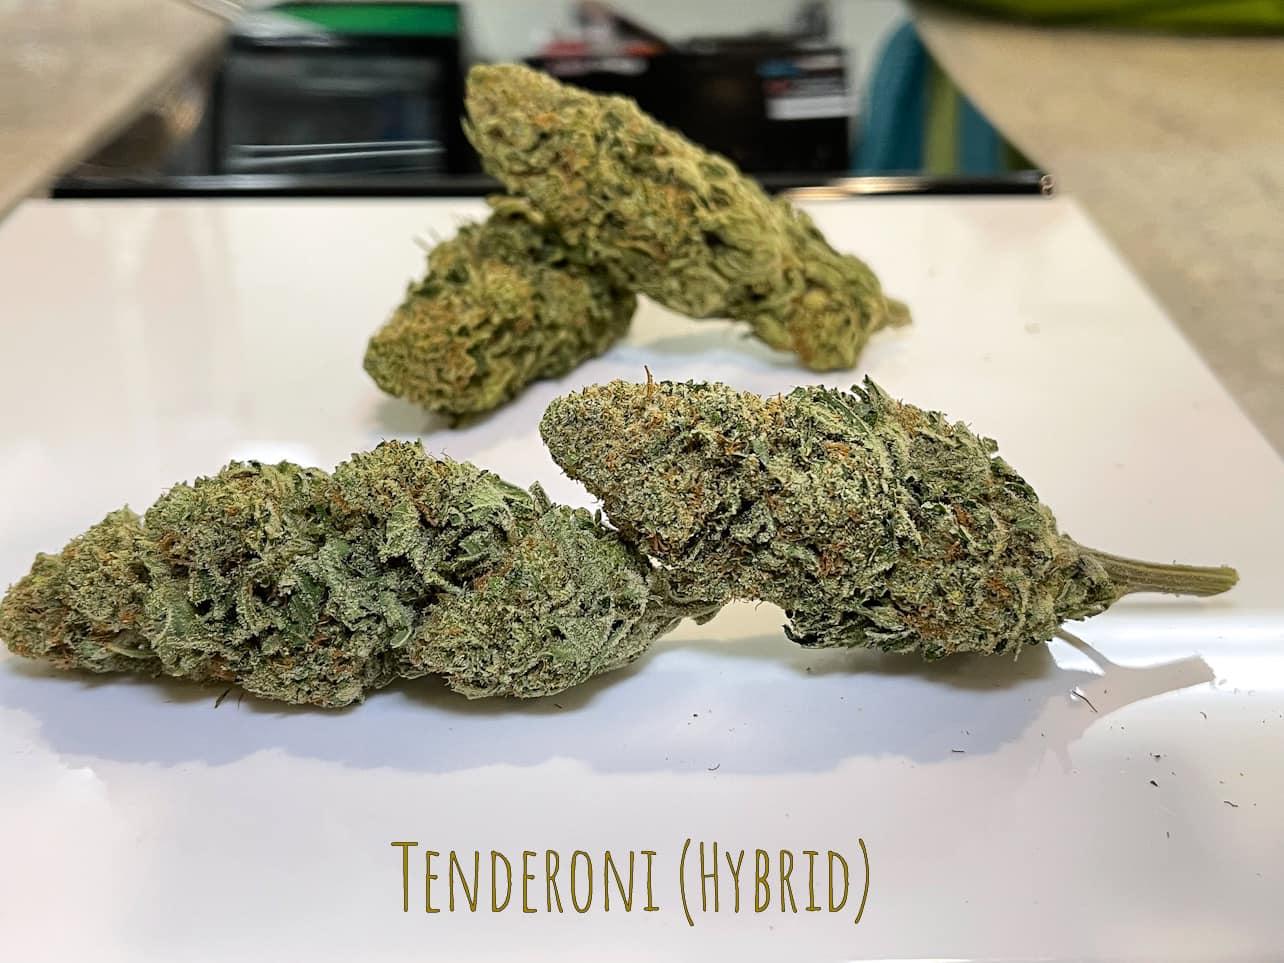 hybrid Calming Tenderoni